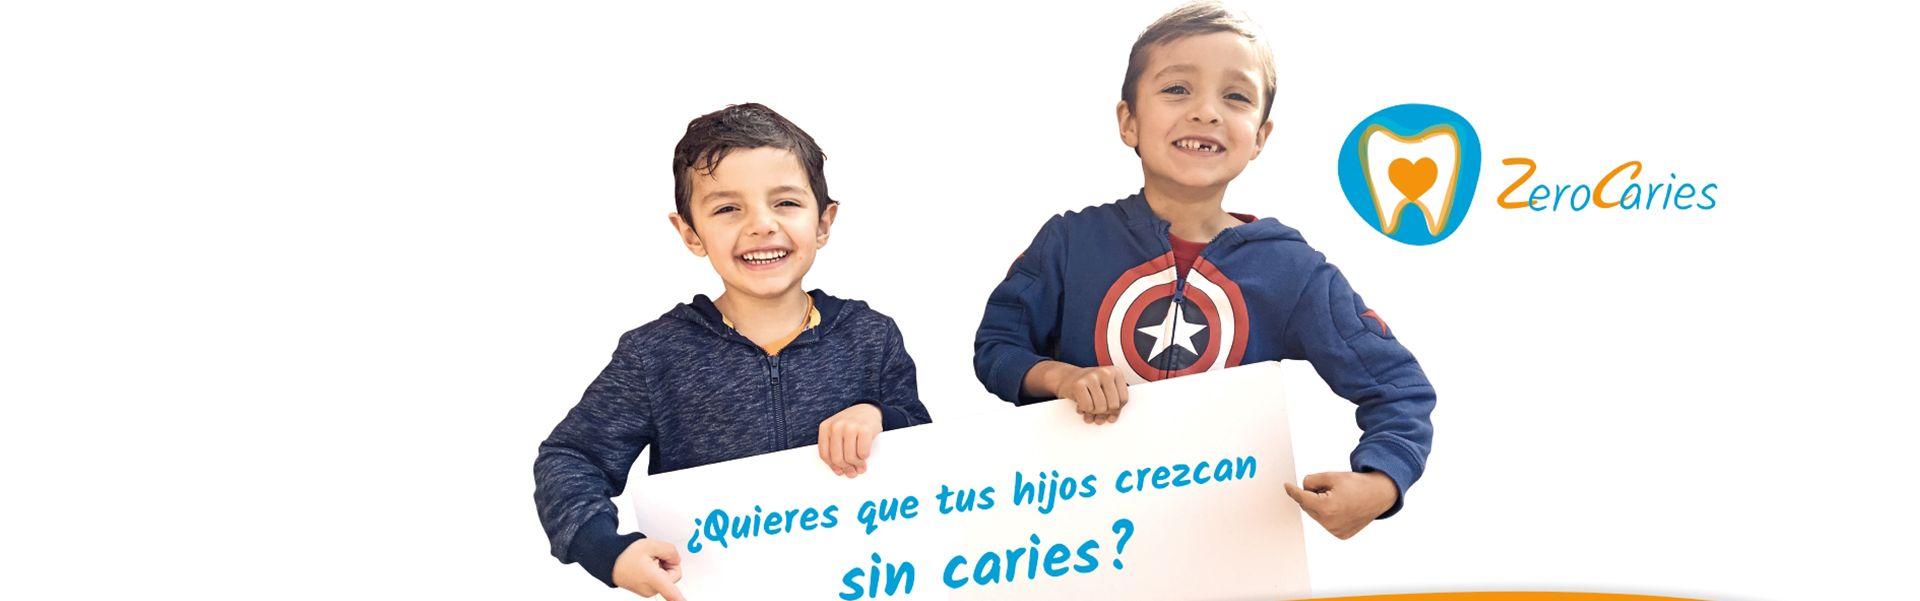 iniciativa zero caries clinica lacasa litner